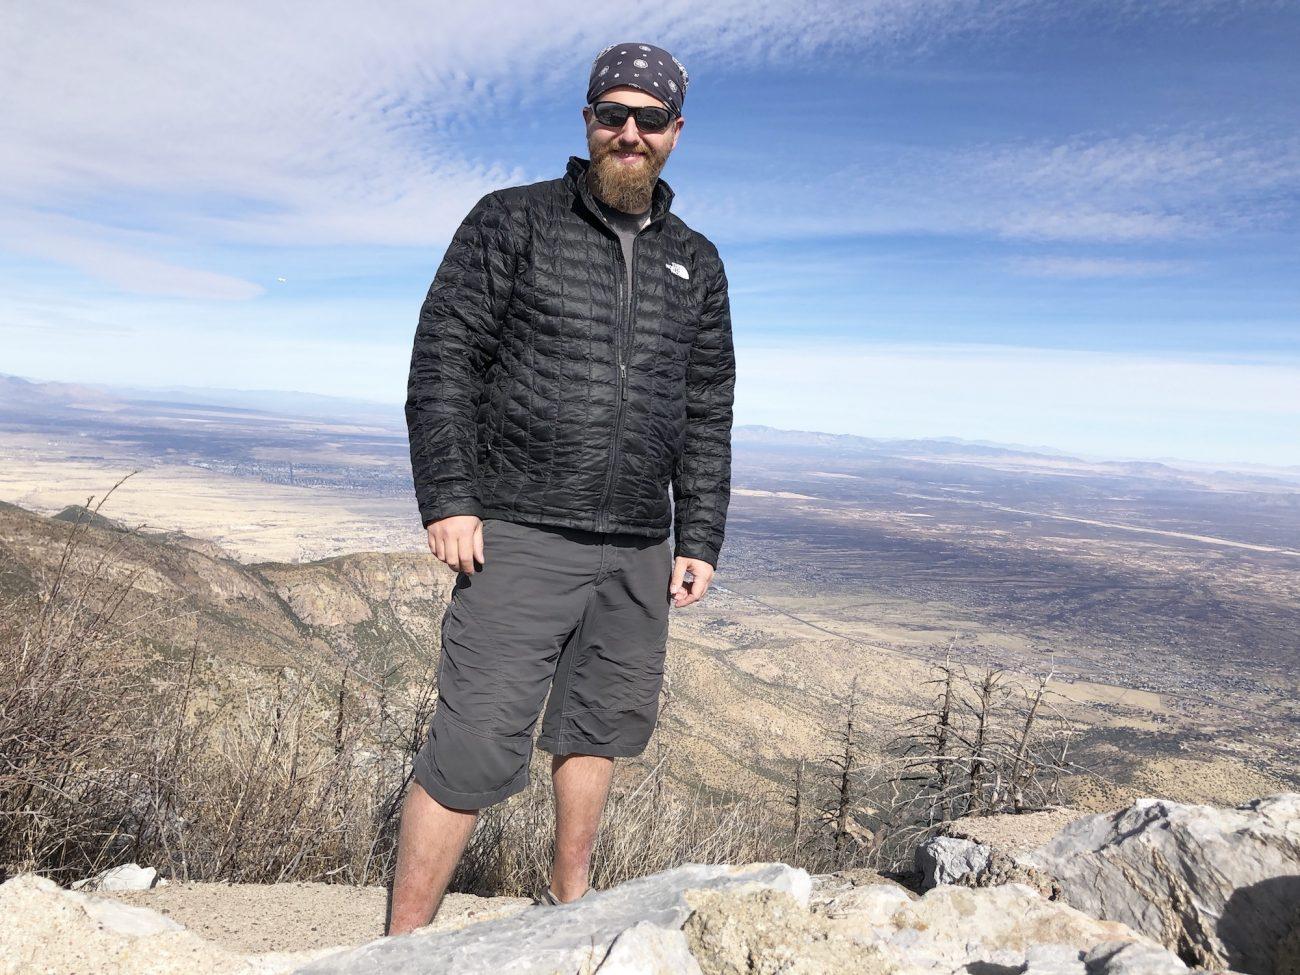 Jon at the top of Miller Peak